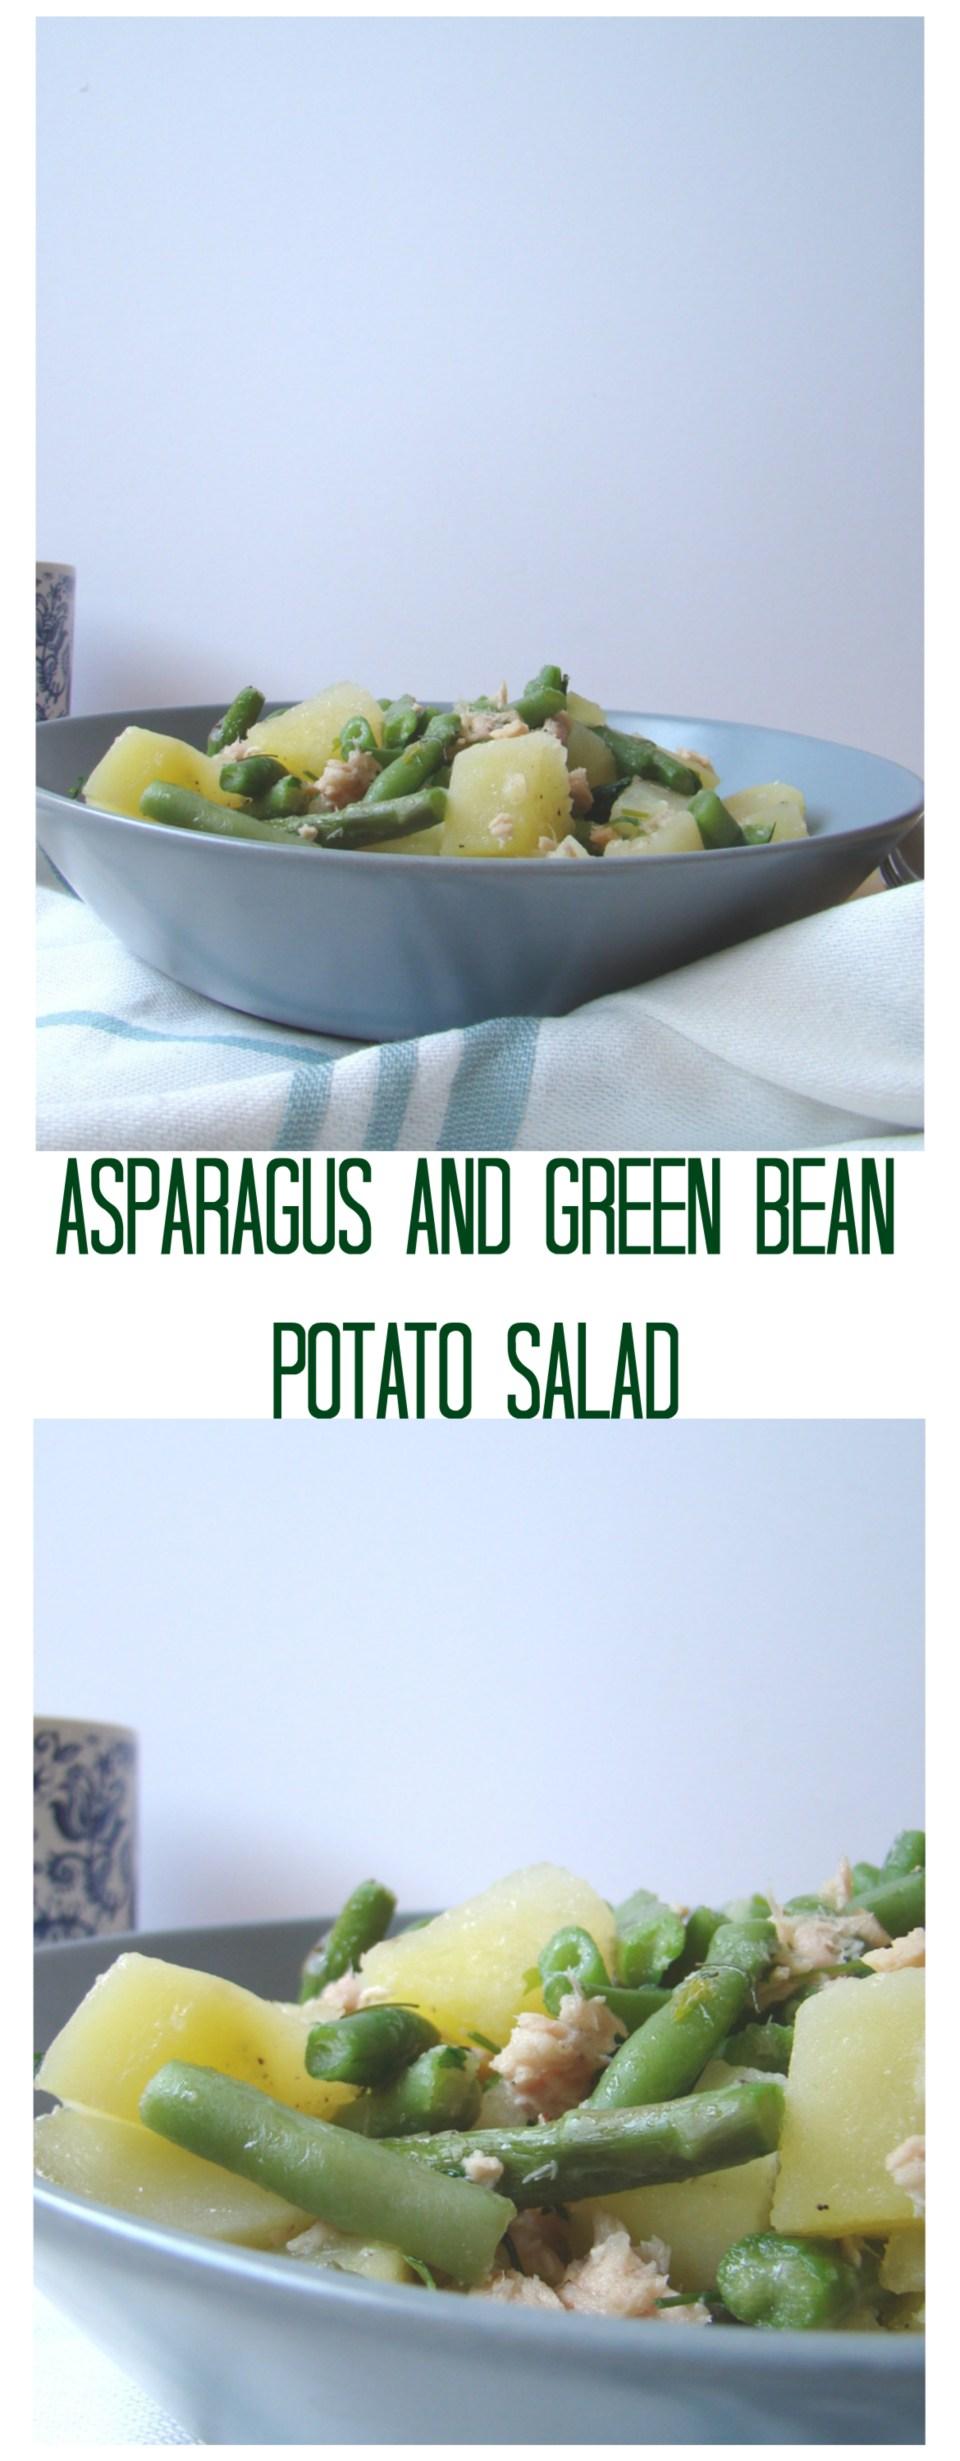 Asparagus and Green Bean Potato Salad